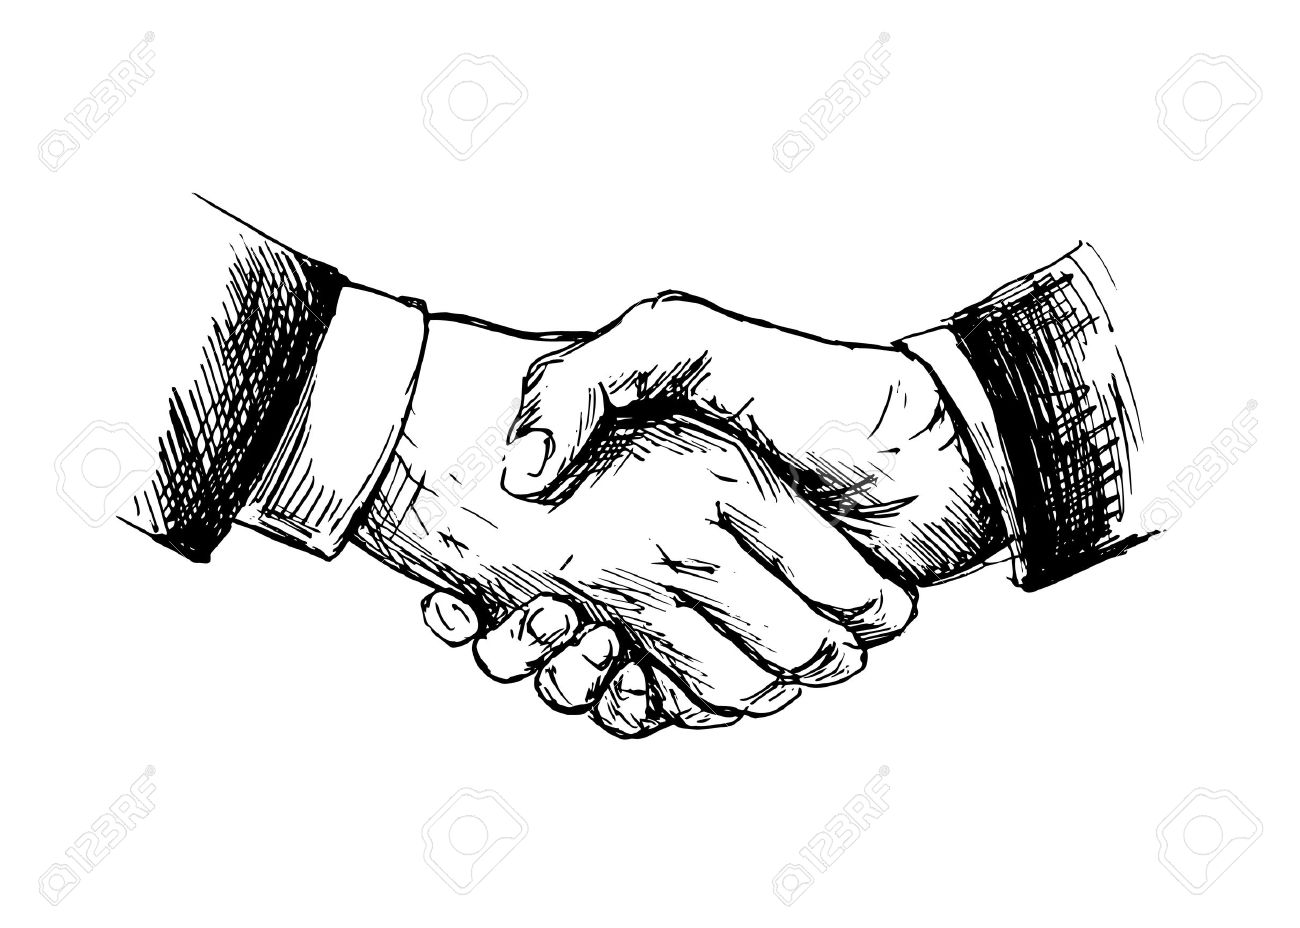 Drawing shake hands Vector illustration - 29299196